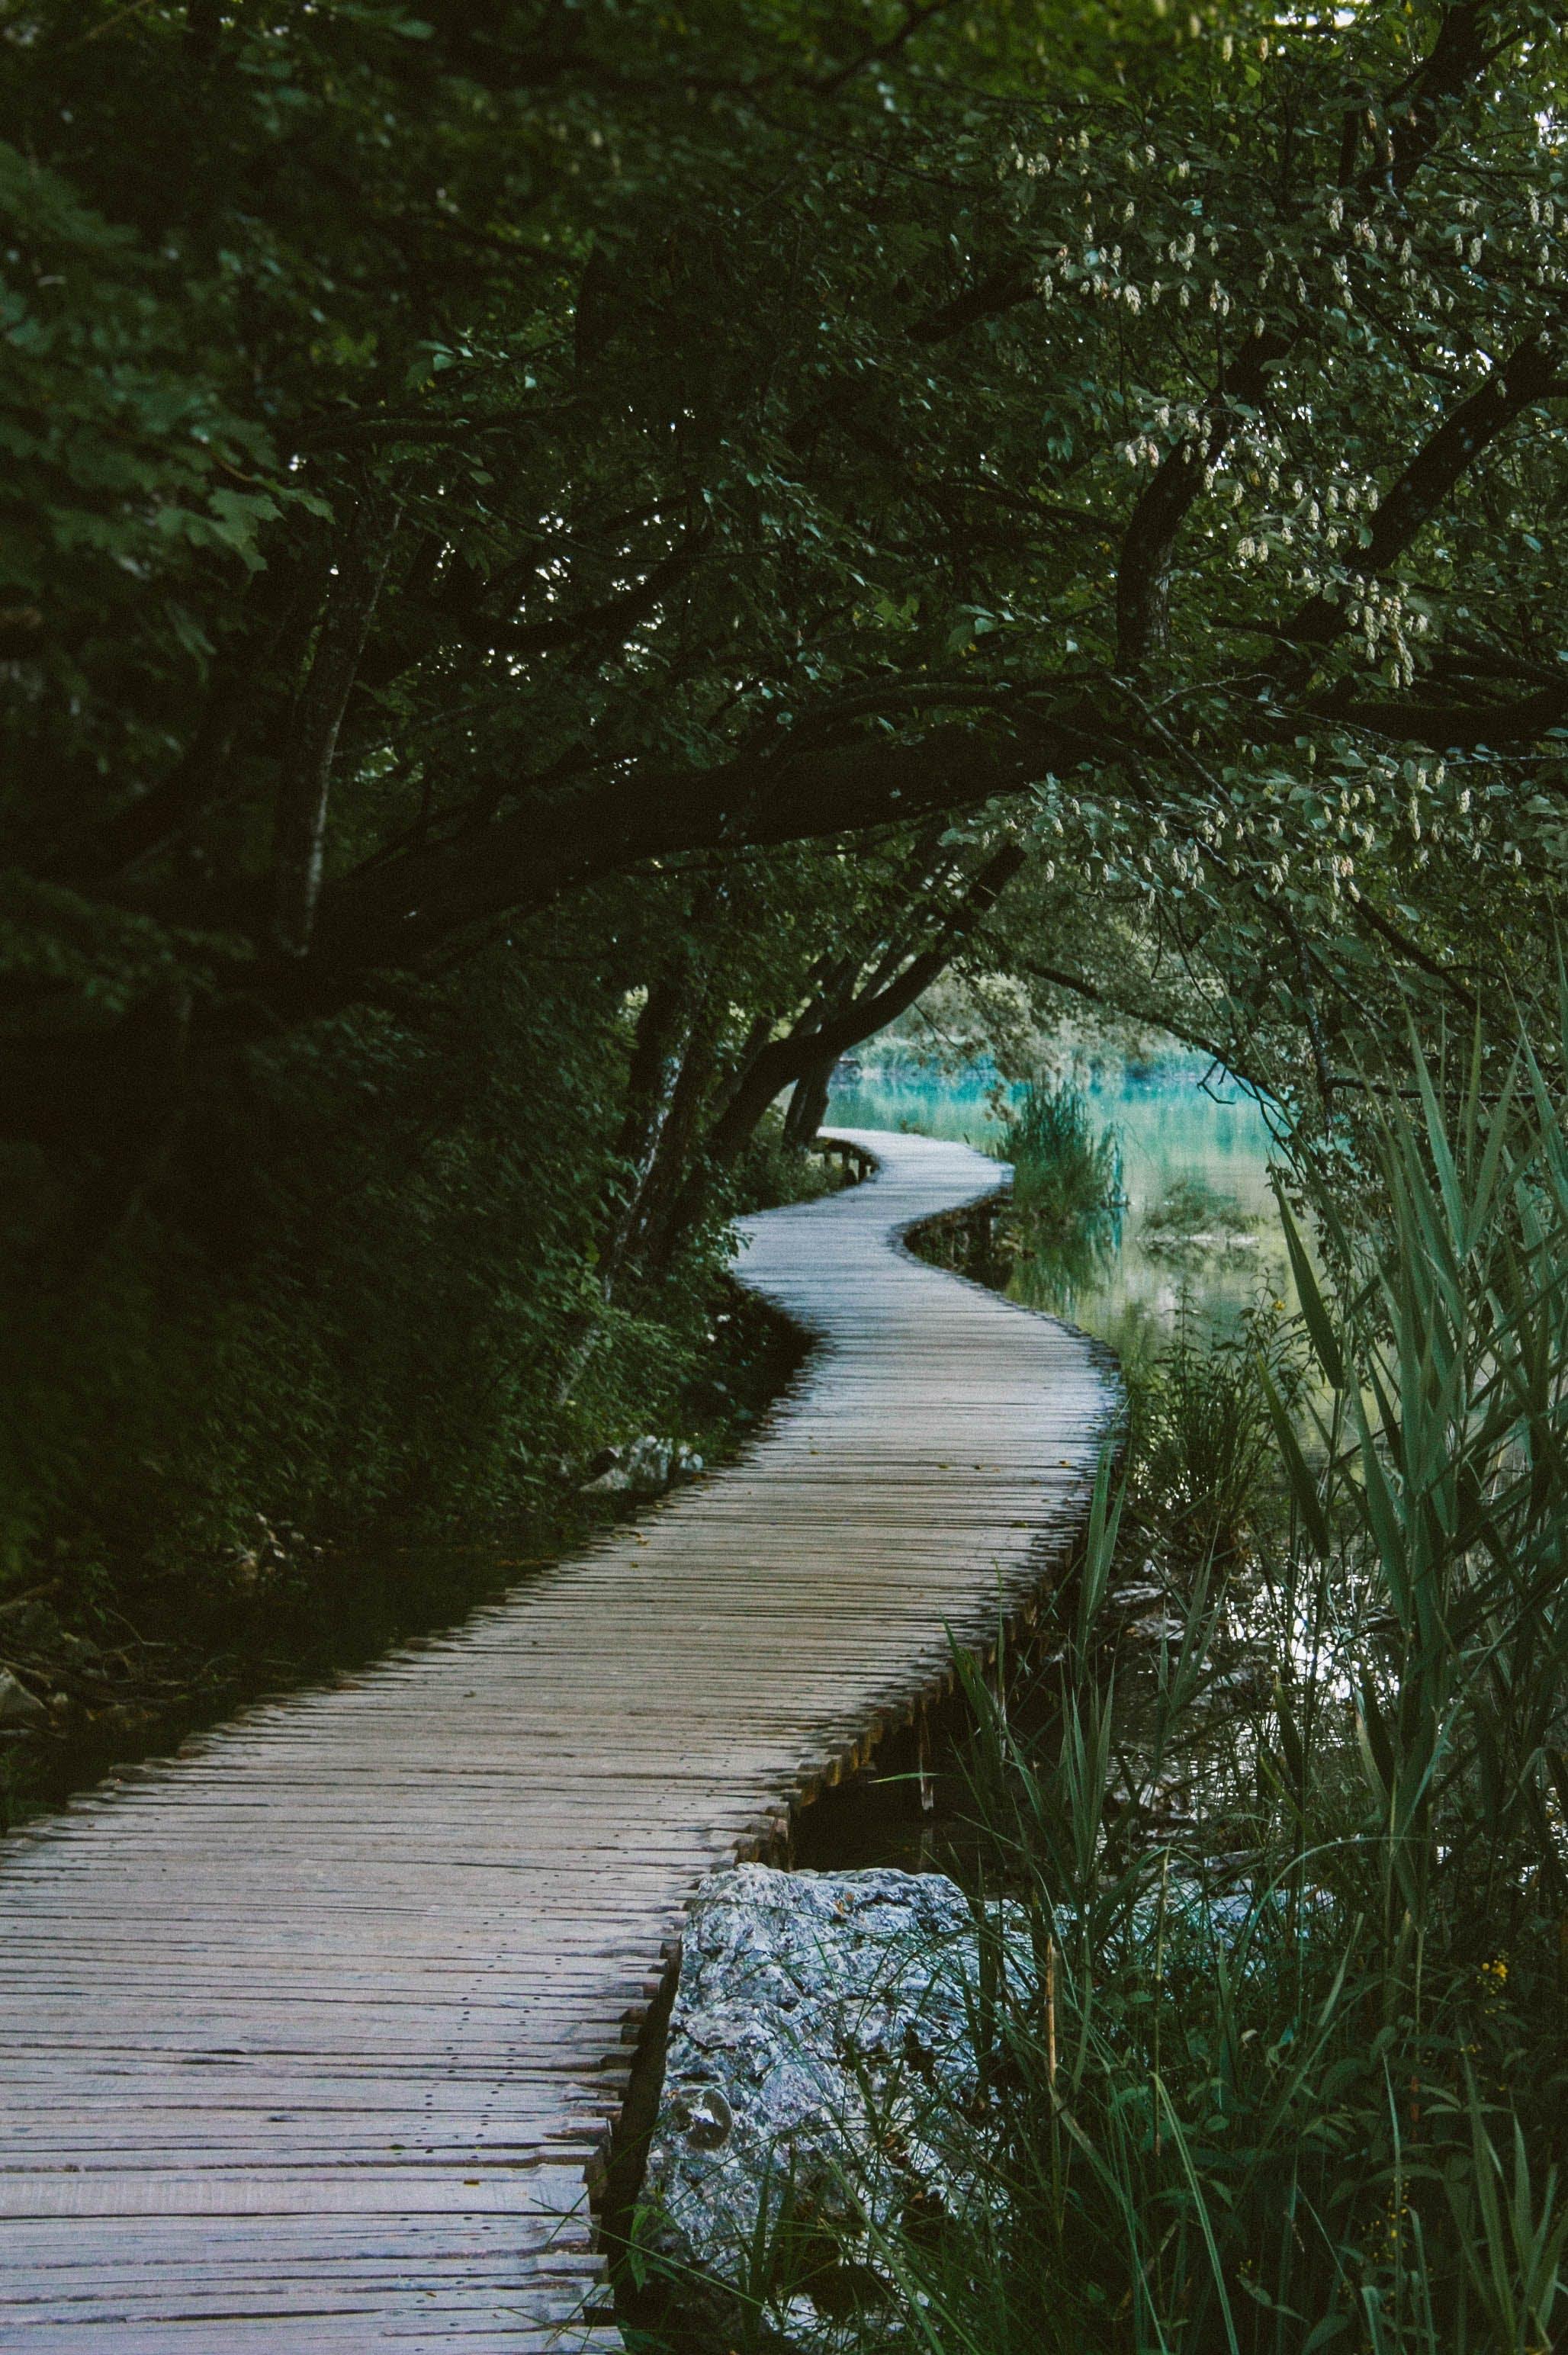 Brown Wooden Bridge Under the Tree Near Body of Water